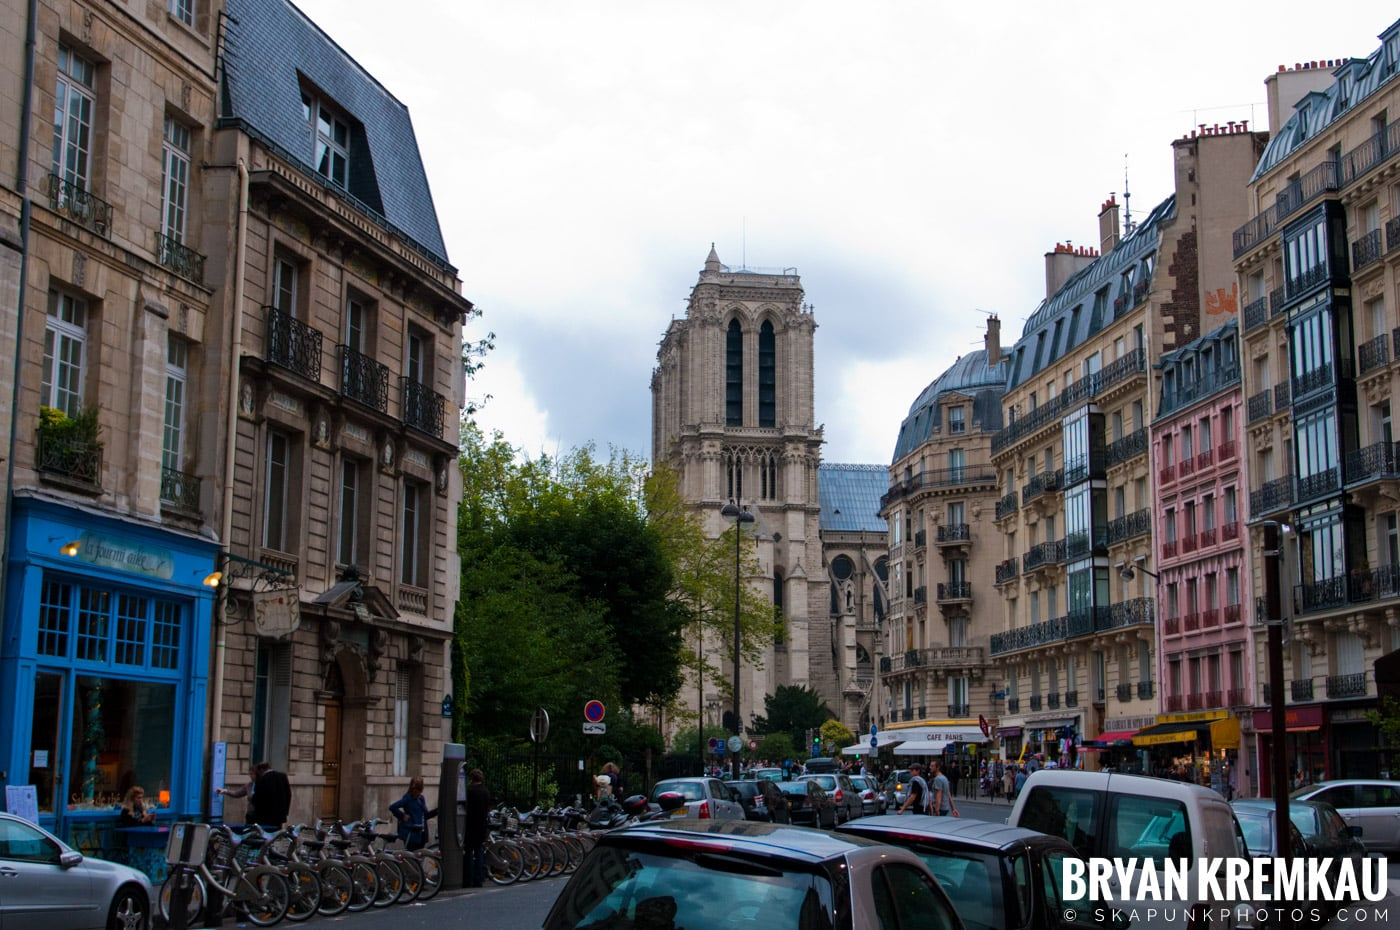 Paris, France Honeymoon - Day 4 - 7.21.11 (107)